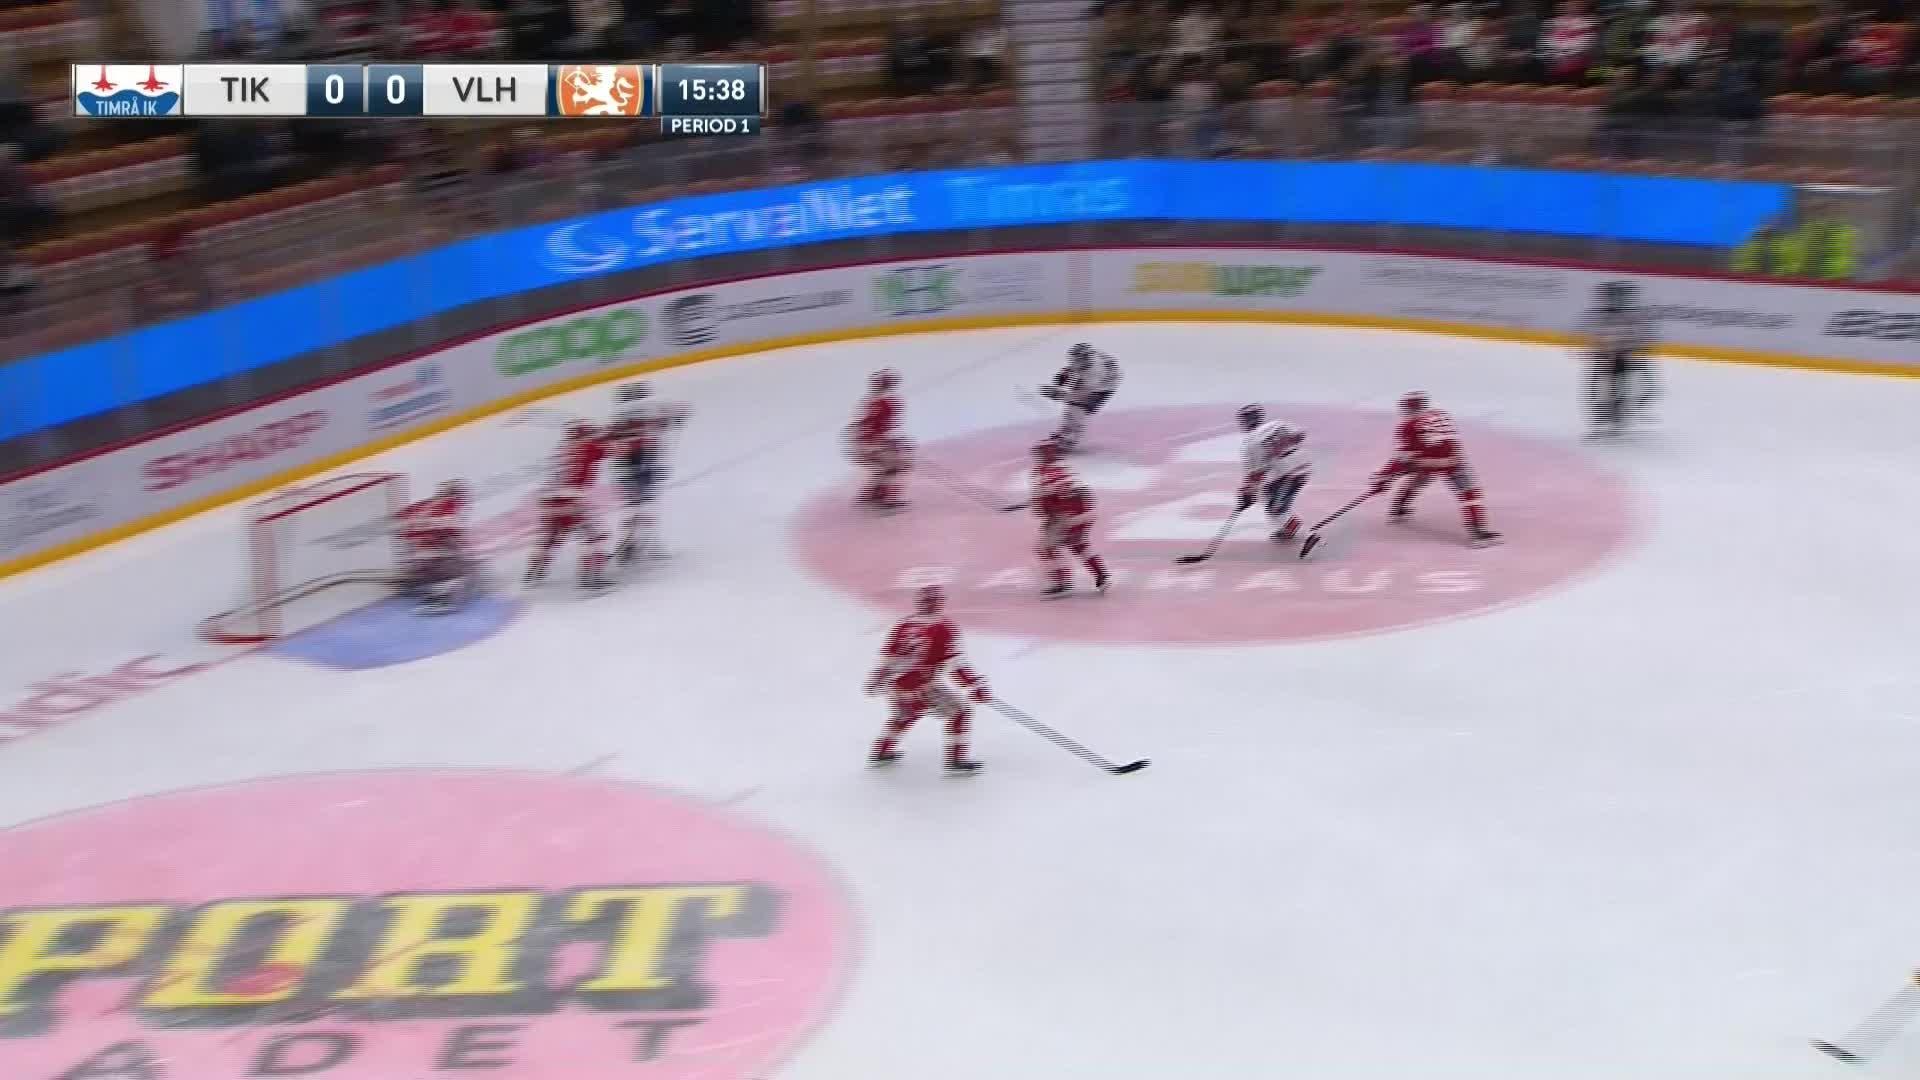 Timrå IK - Växjö Lakers 0-1